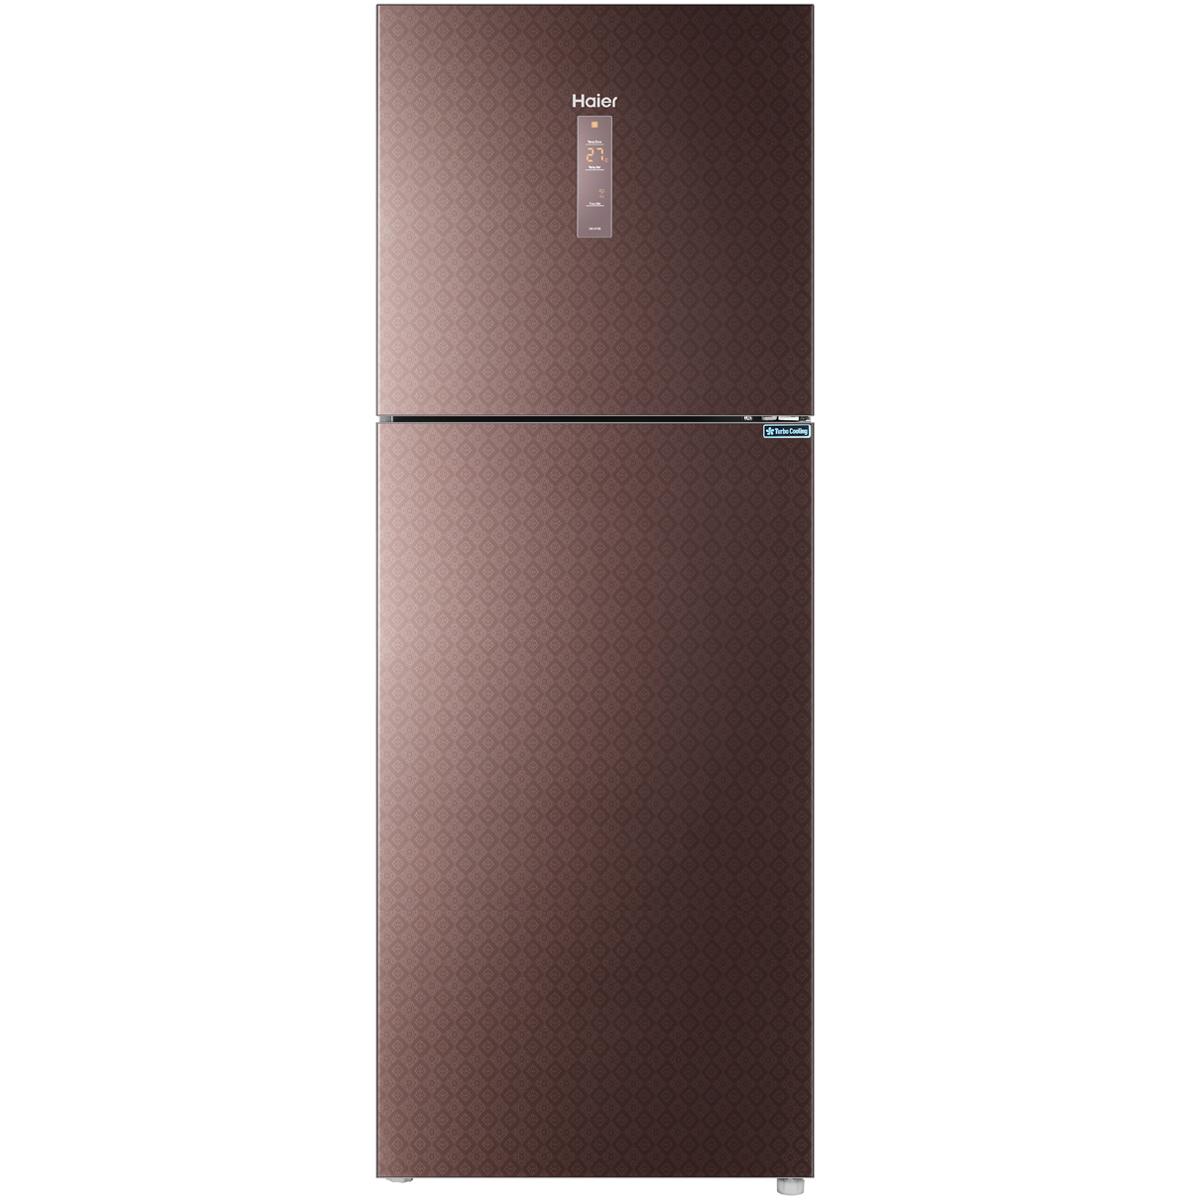 refrigerator haier. image refrigerator haier